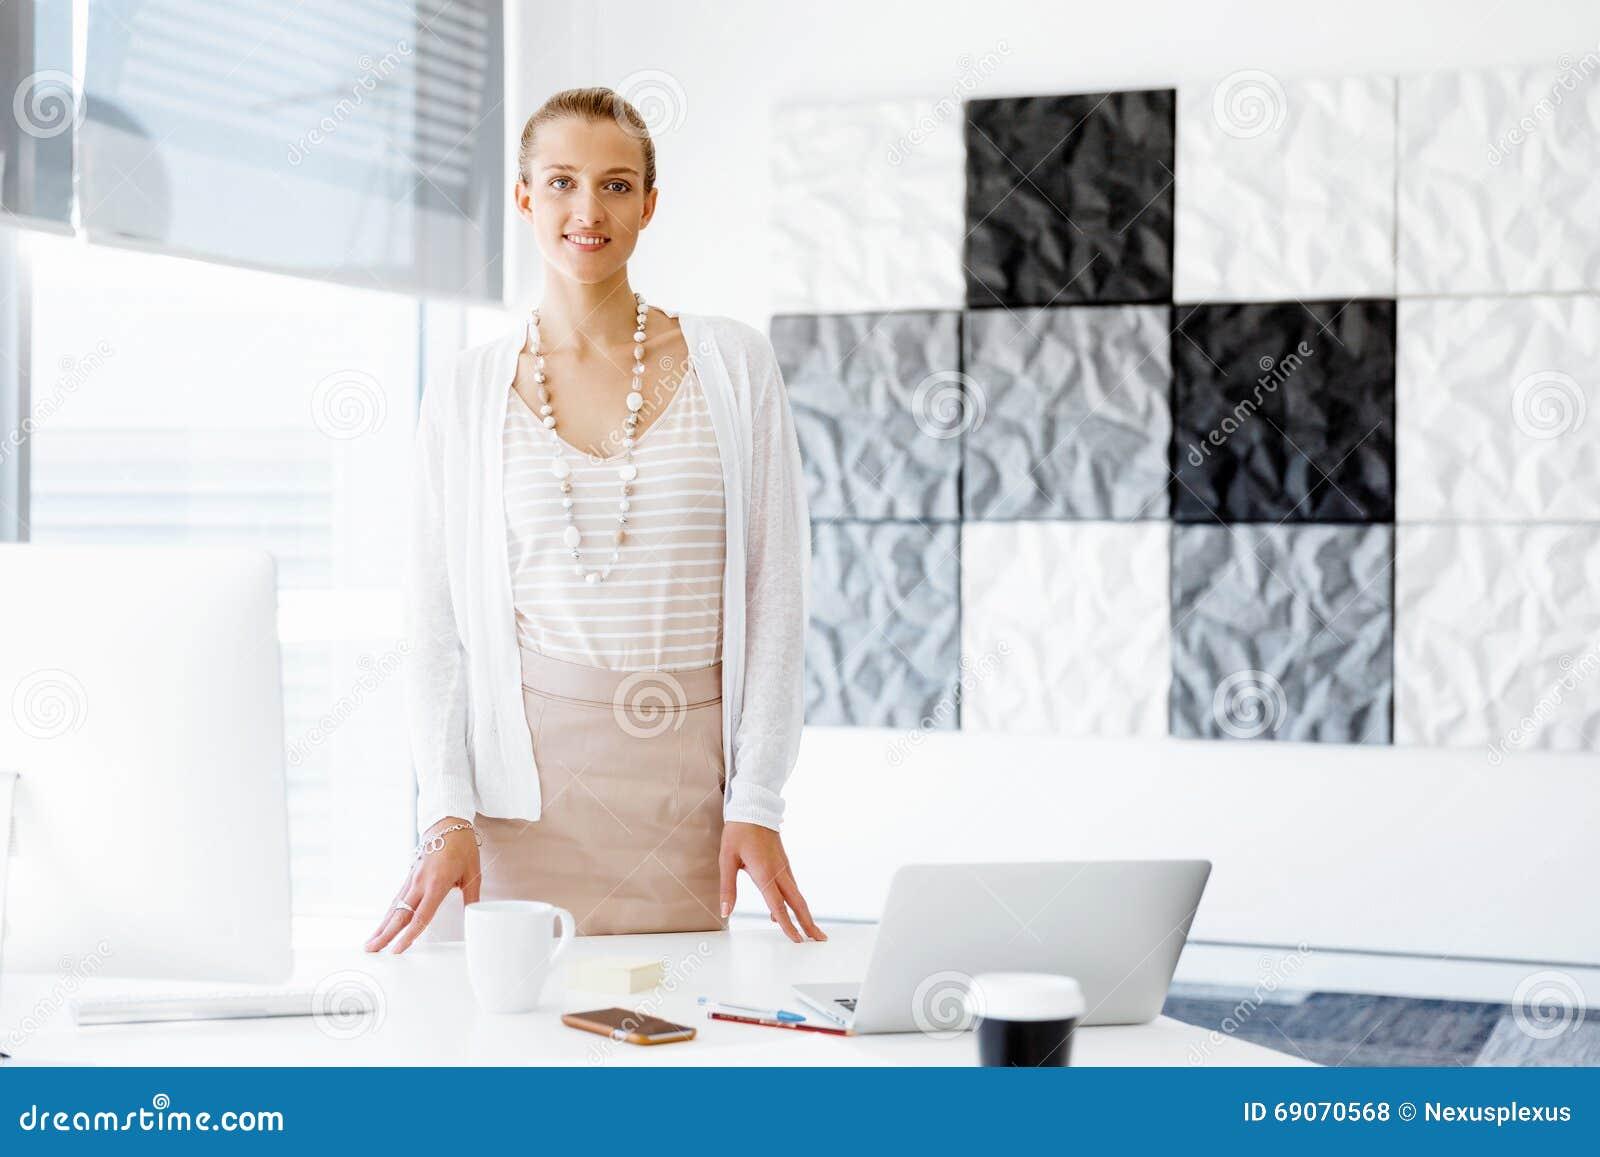 employ de bureau attirant se tenant c t de la fen tre photo stock image 69070568. Black Bedroom Furniture Sets. Home Design Ideas